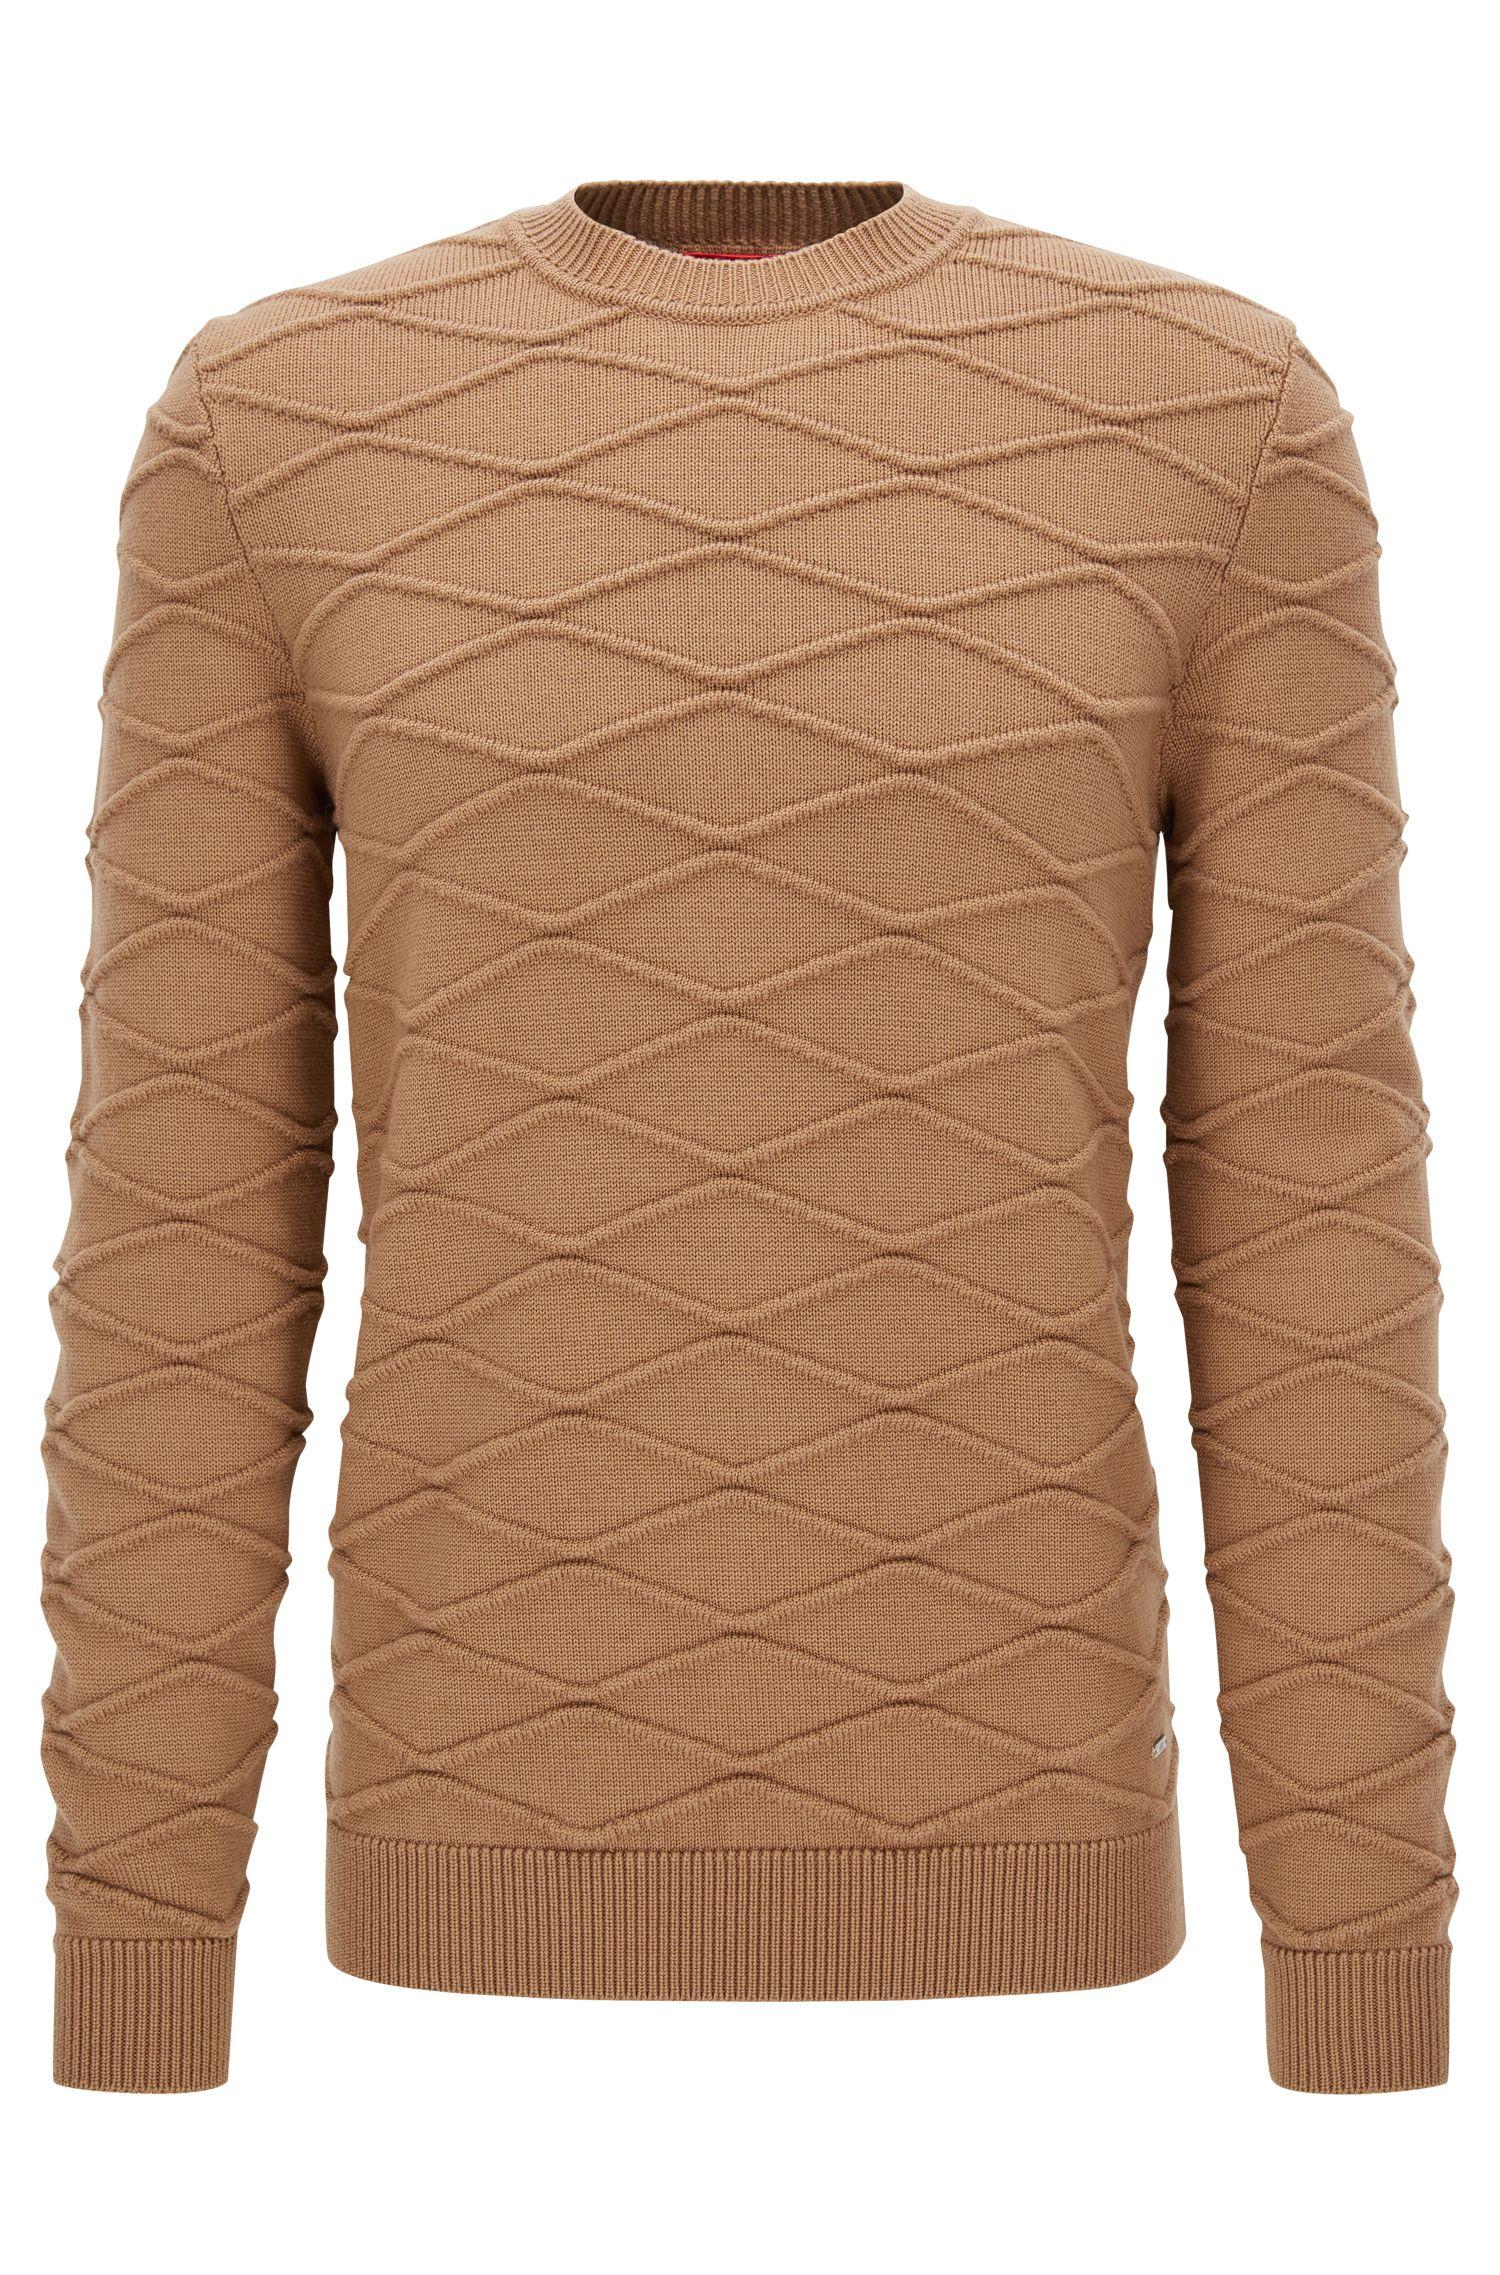 Virgin Wool Sweater | Svave, Brown